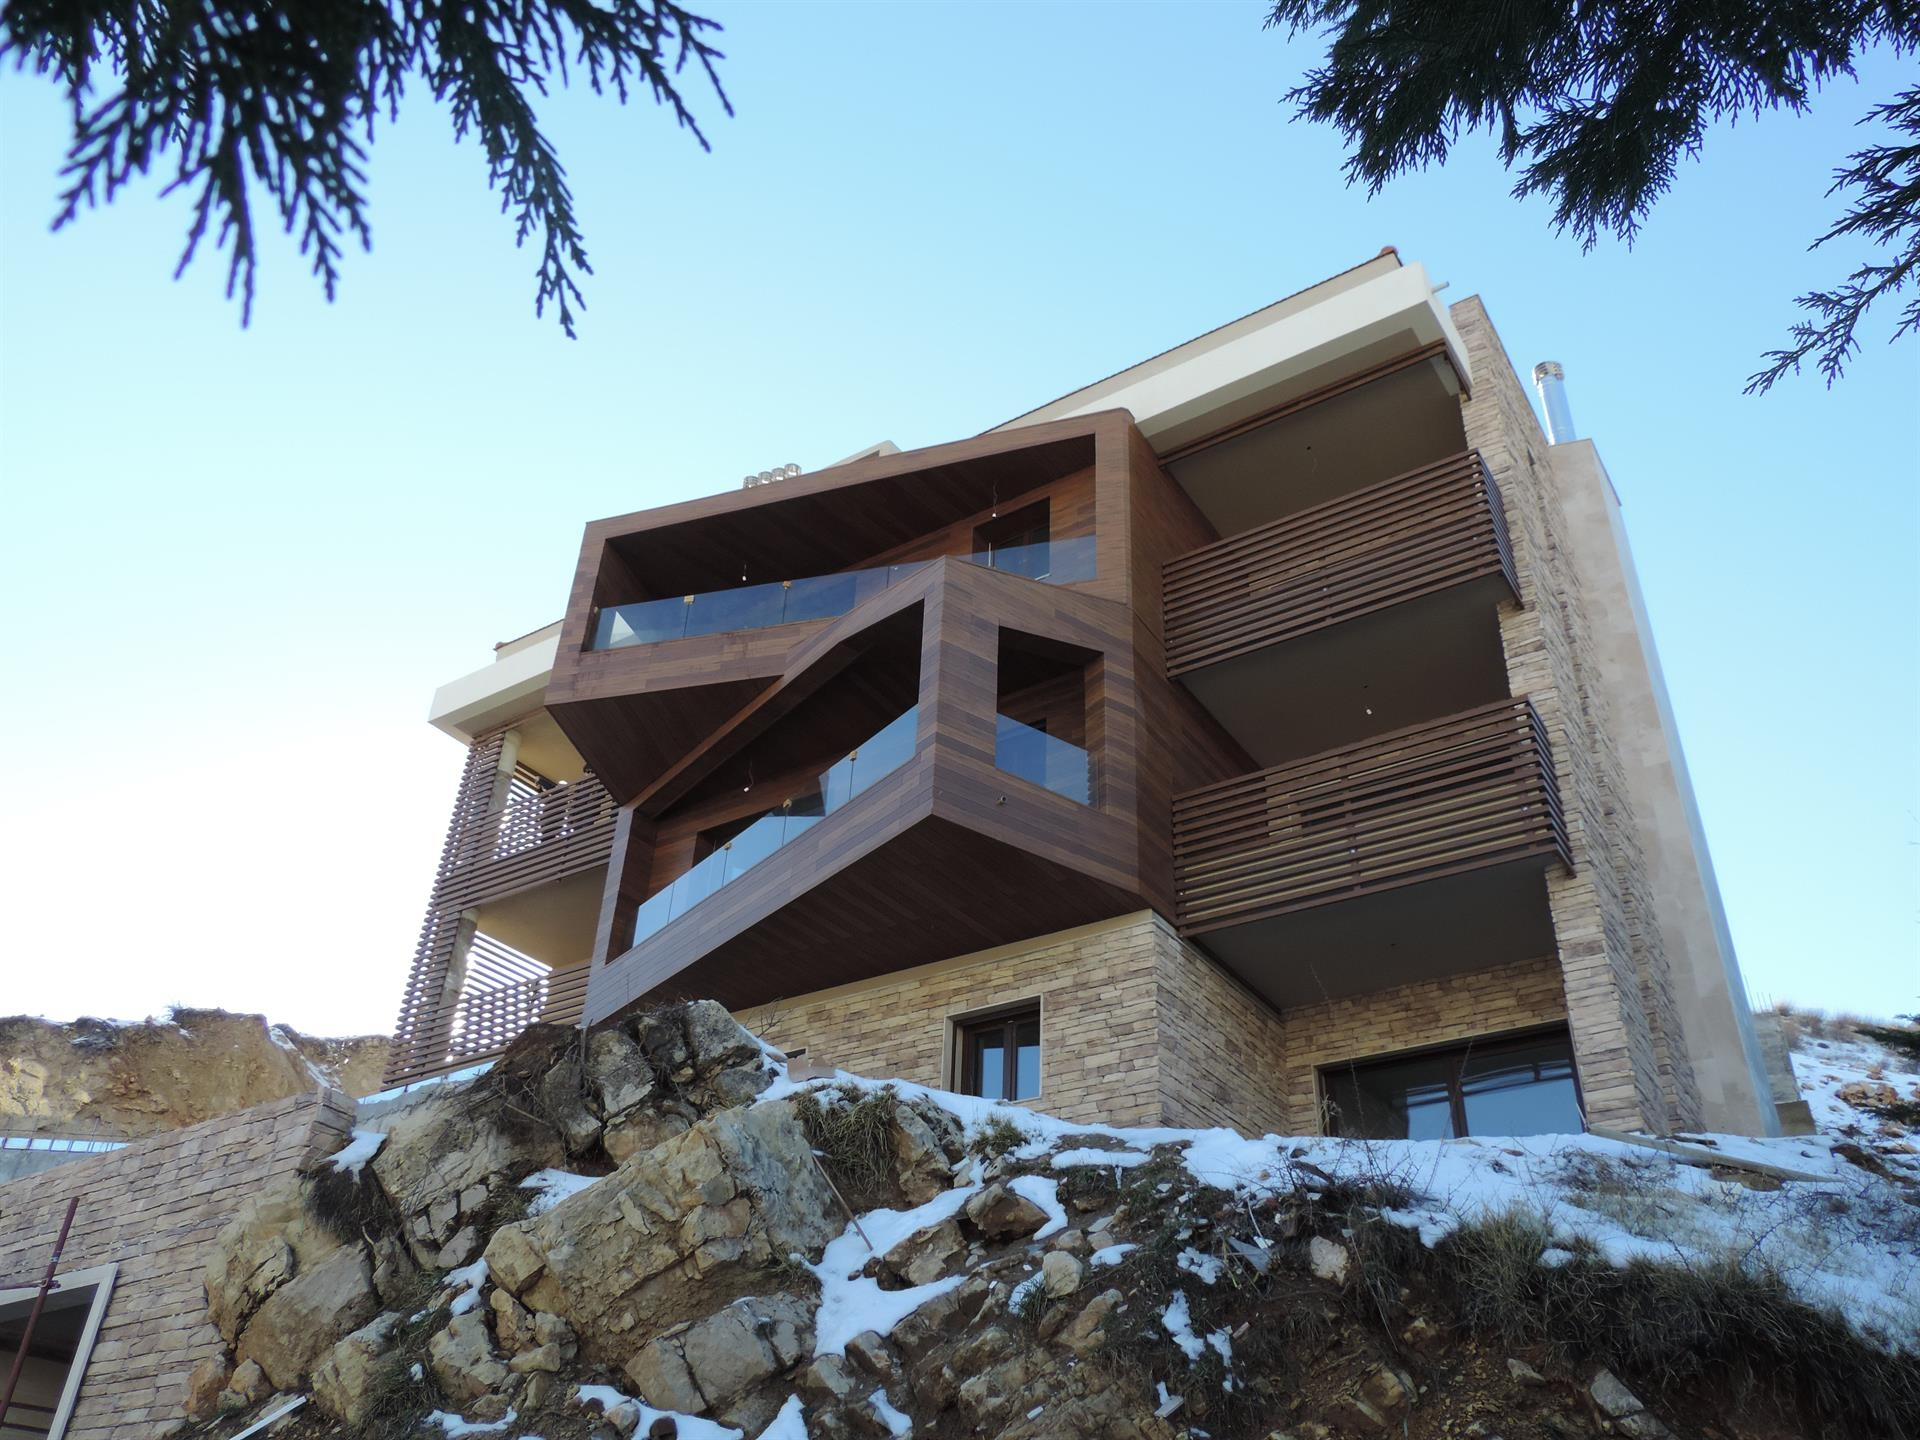 Woodn vivienda Libano 7 1920x1440 c